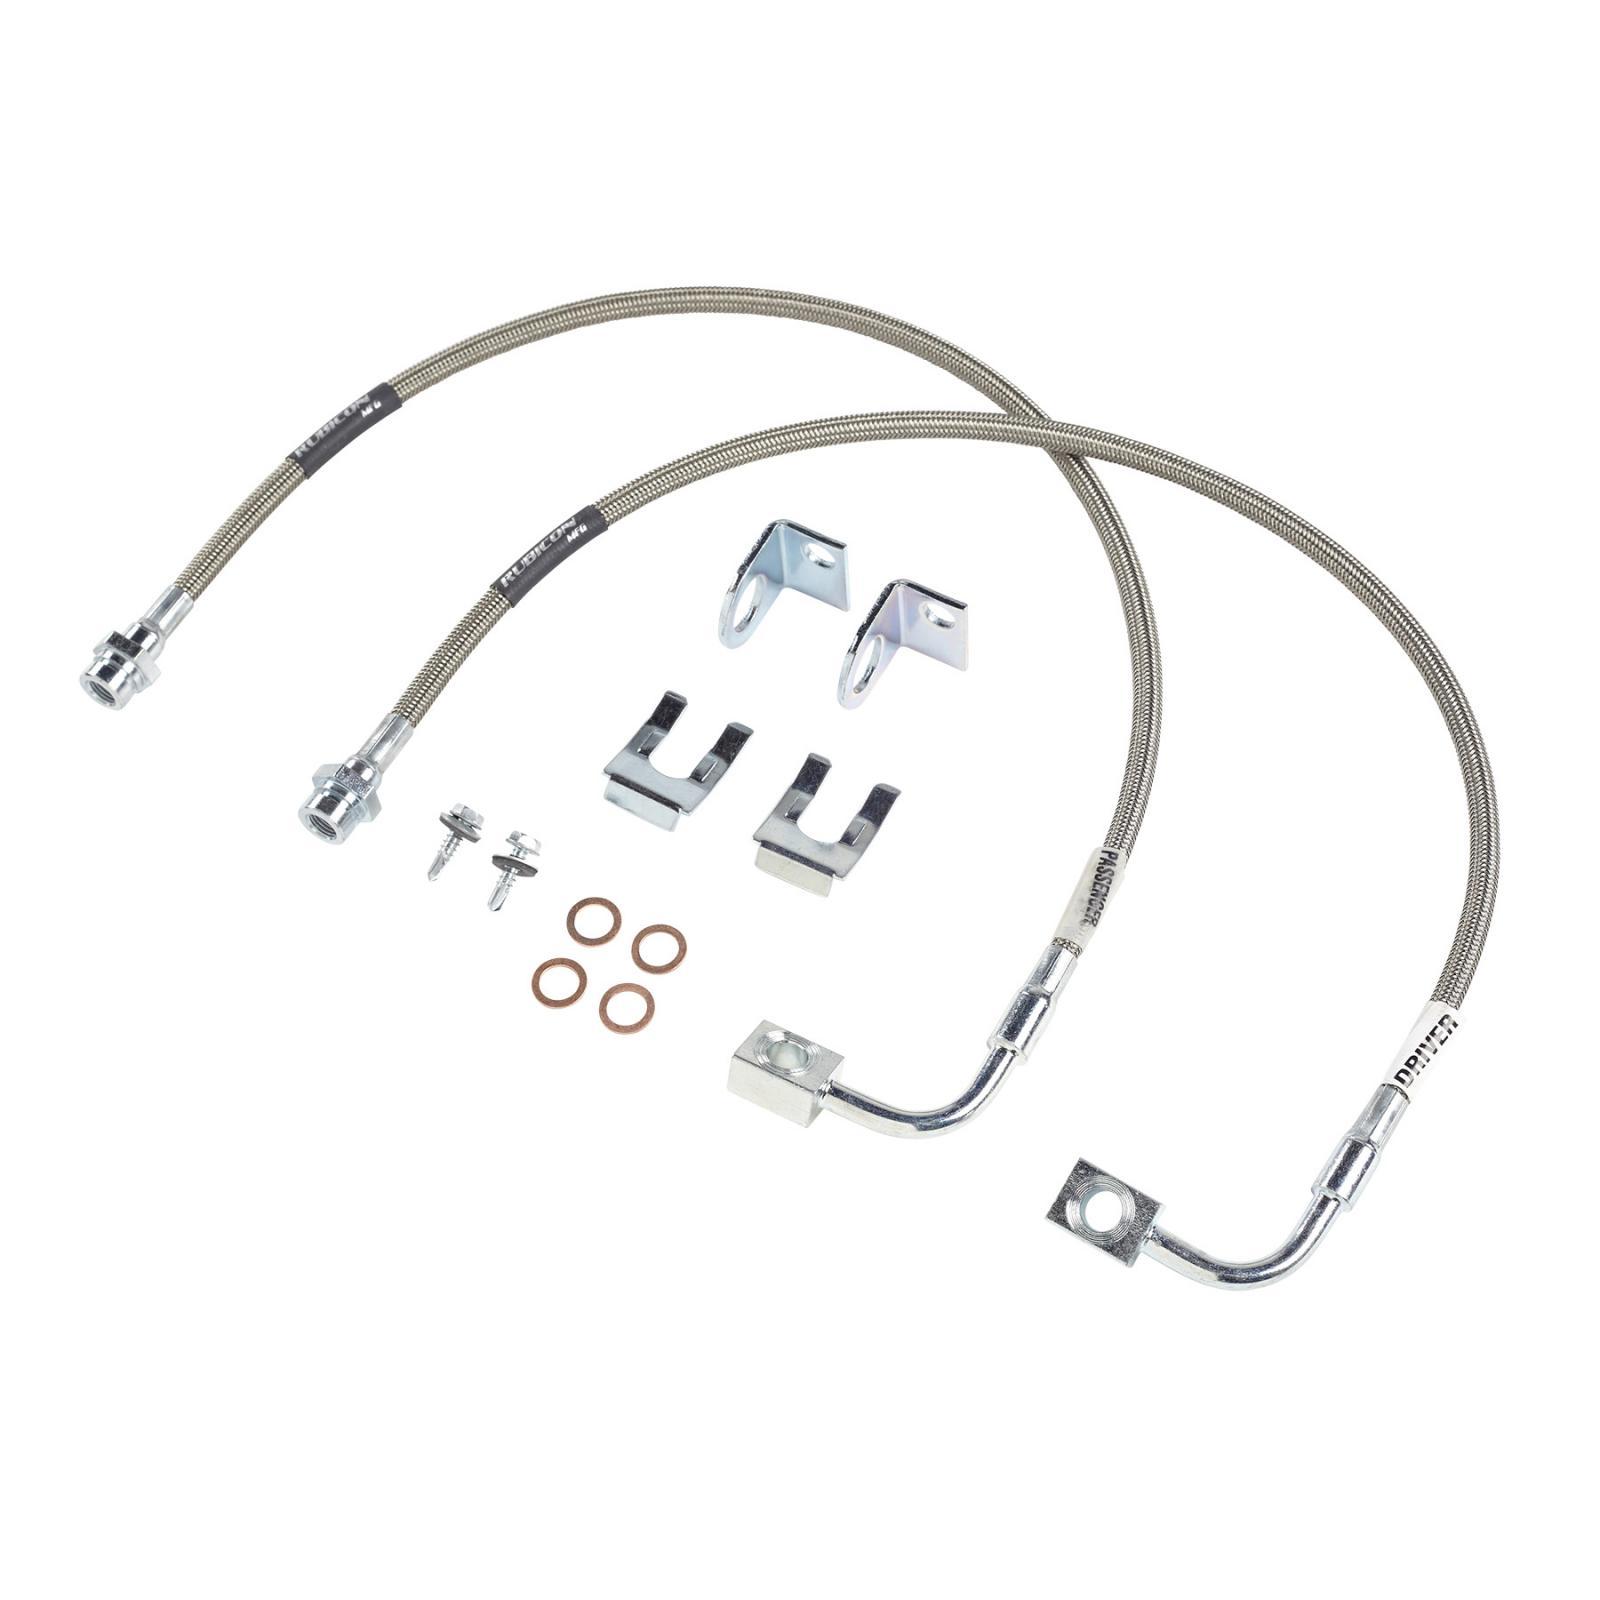 Rubicon Express Front Brake Line Set 24 Inch W Install Kit